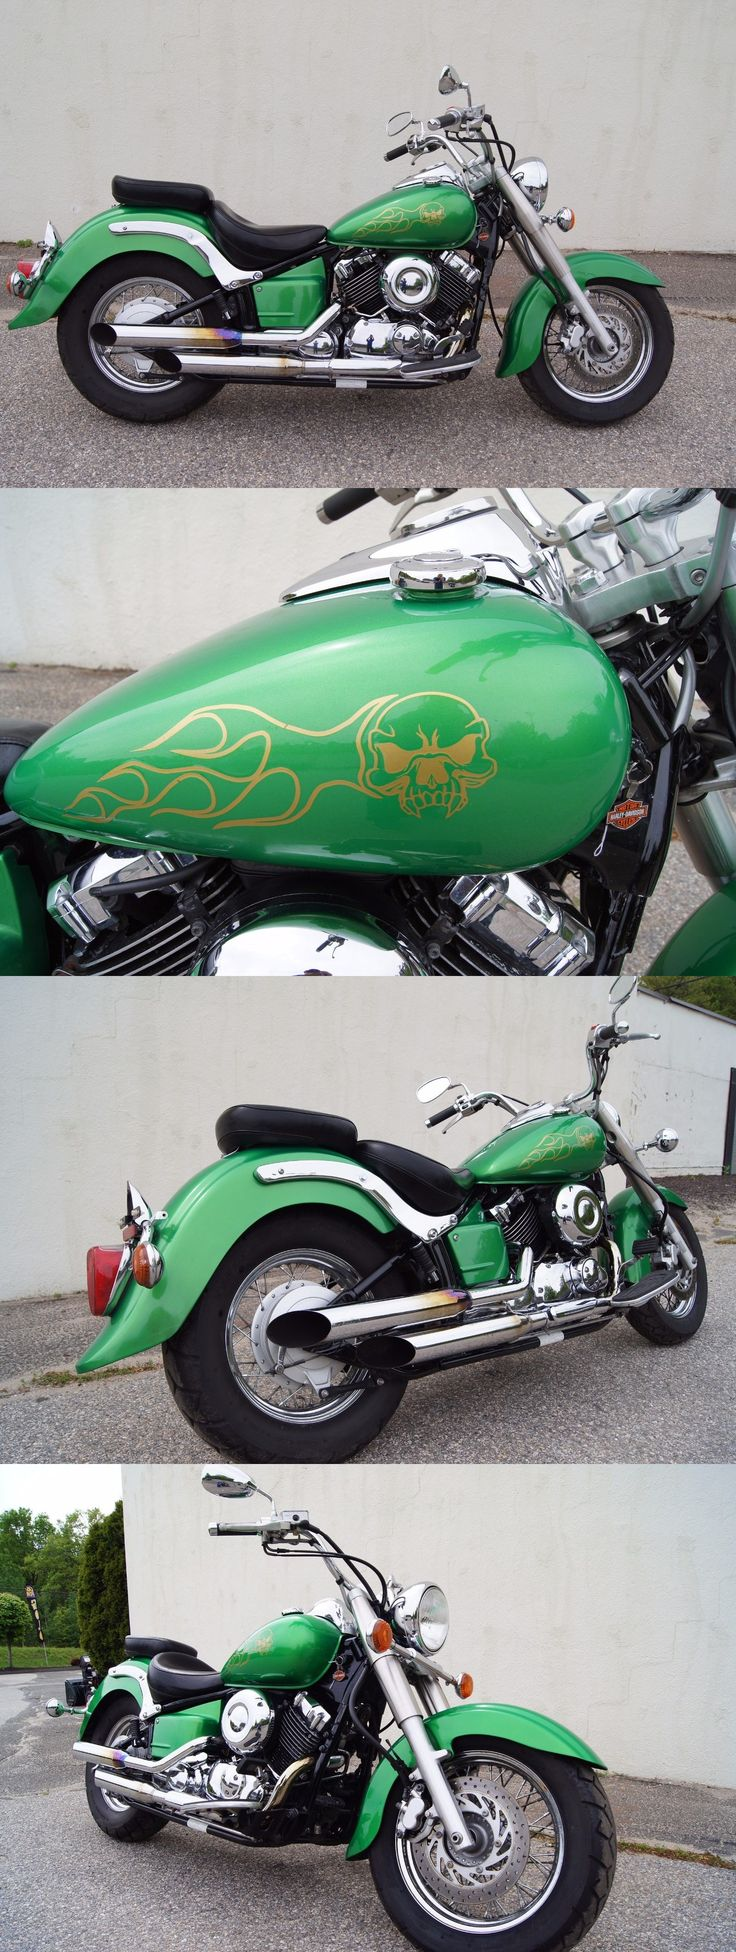 Motorcycles: 2003 Yamaha V Star 2003 Yamaha Xvs65 A Motorcycle V Star 650 Classic -> BUY IT NOW ONLY: $1795 on eBay!